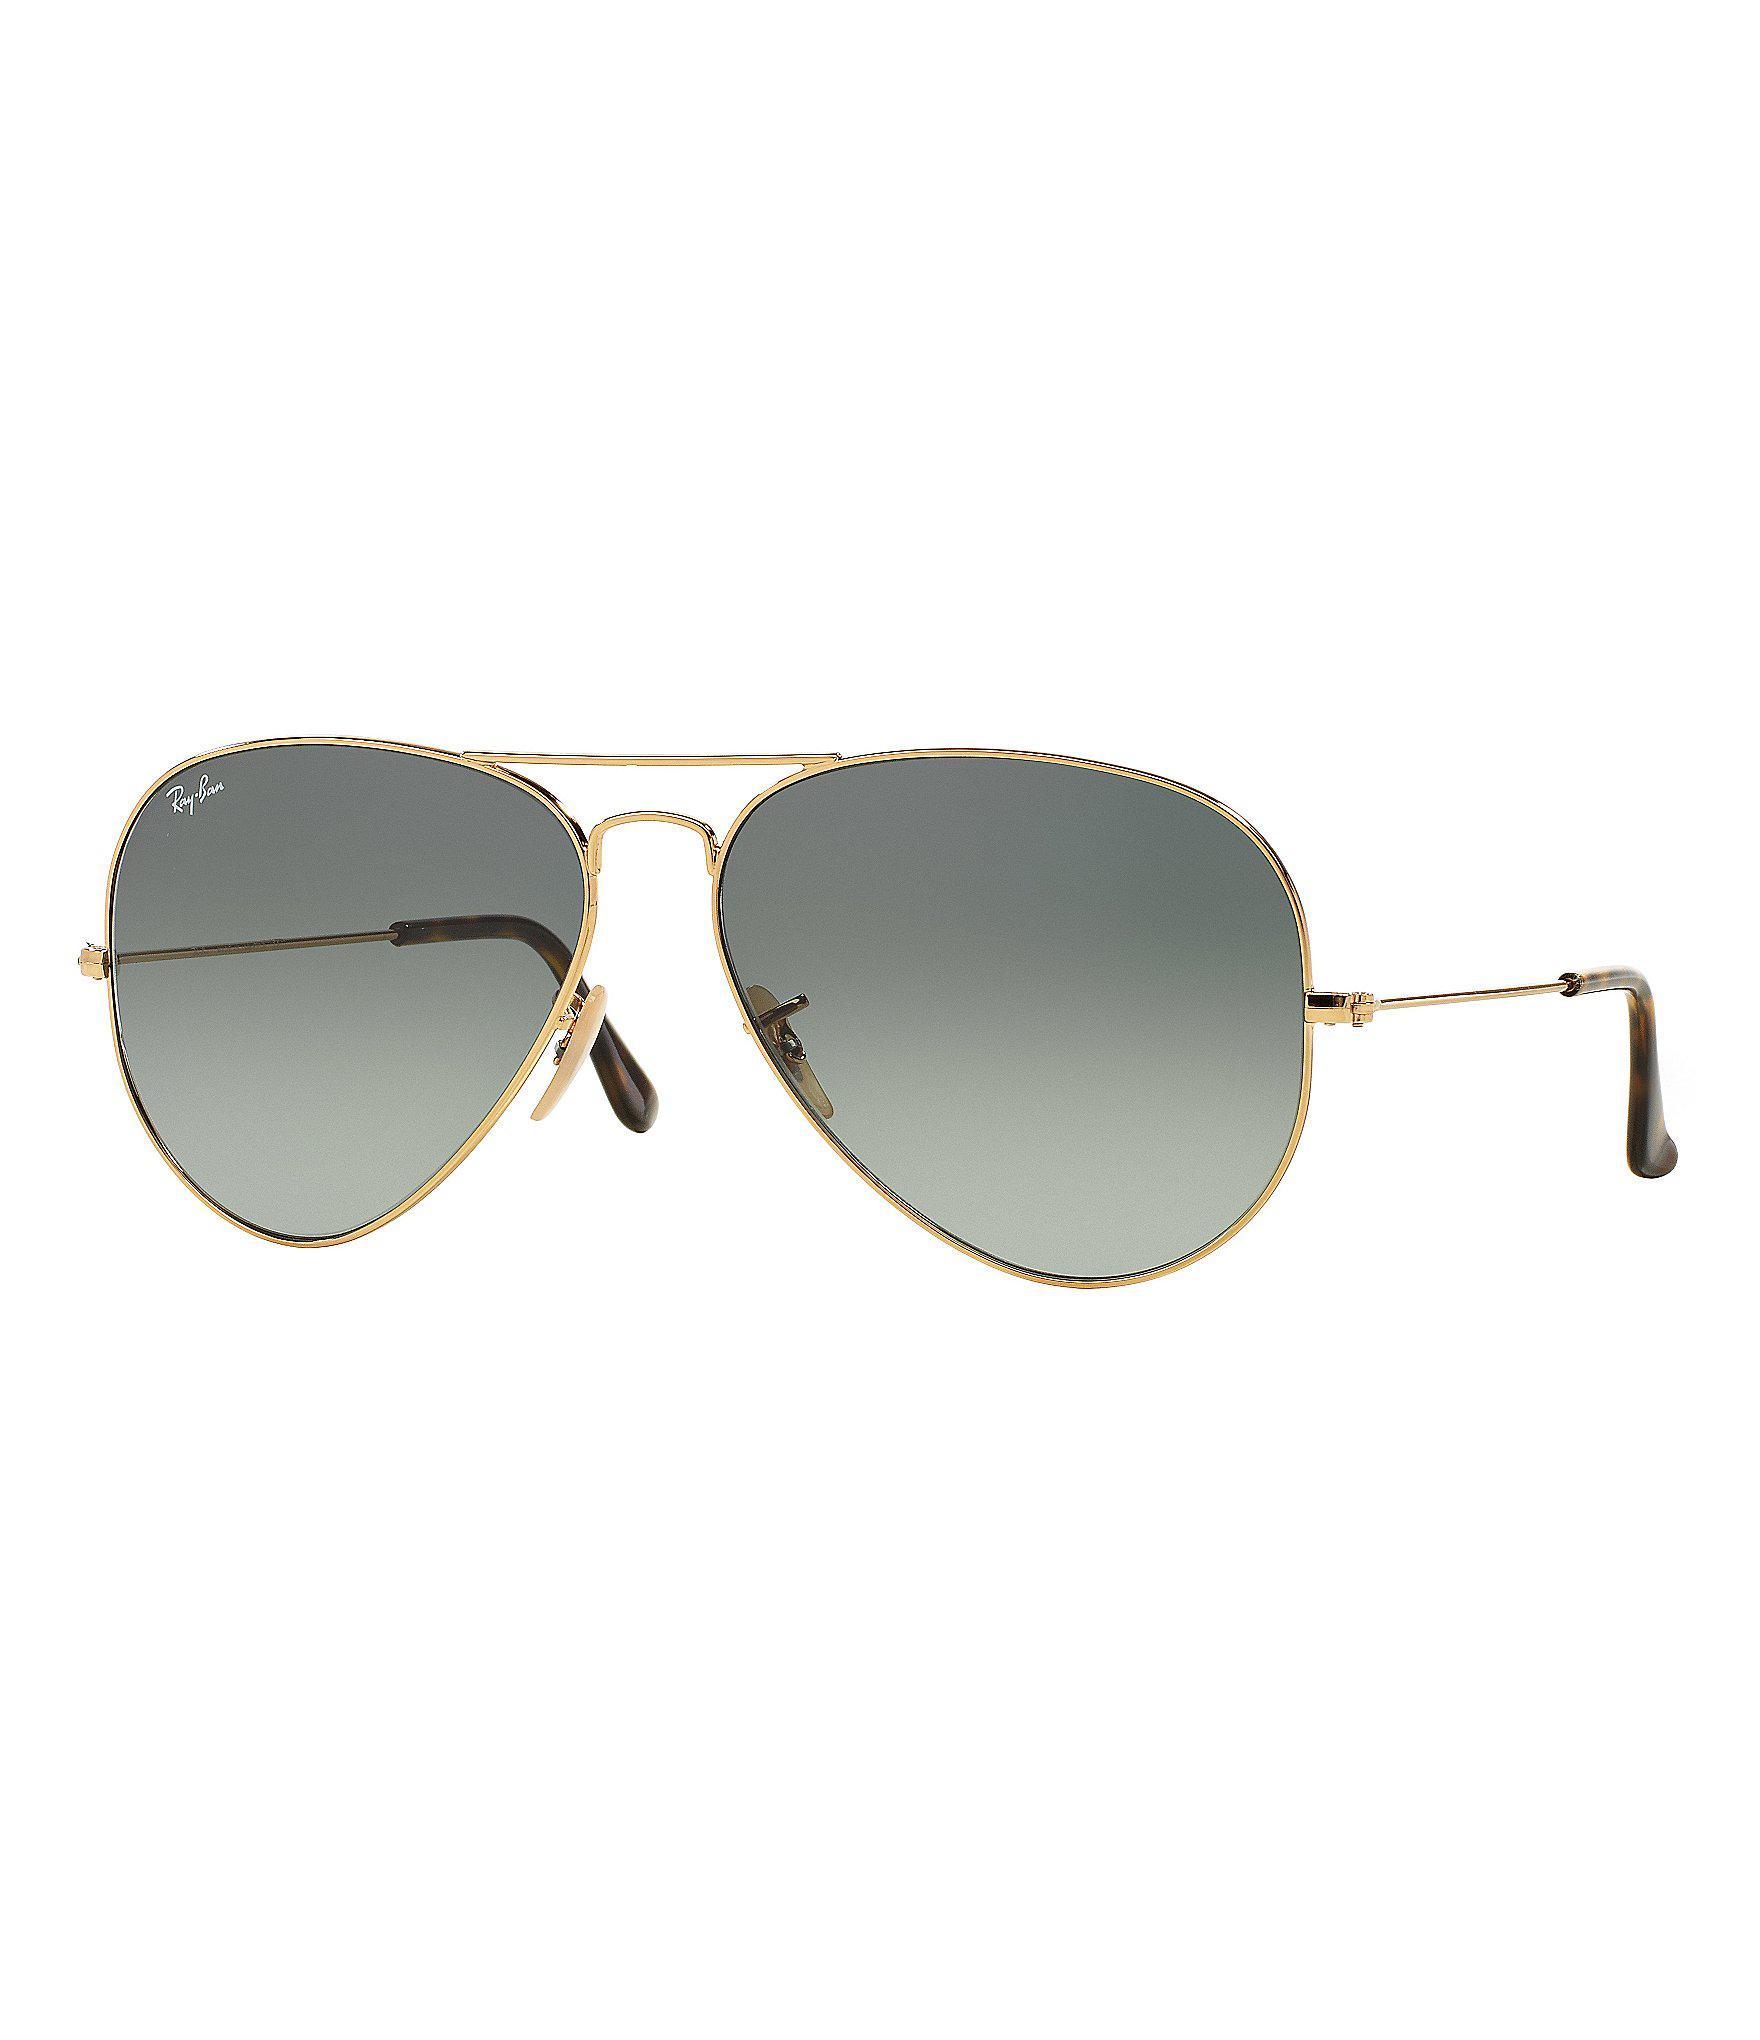 7190f30af0e Ray-Ban. Men s Black Classic Aviator Uva uvb Protection Flash Lens  Sunglasses